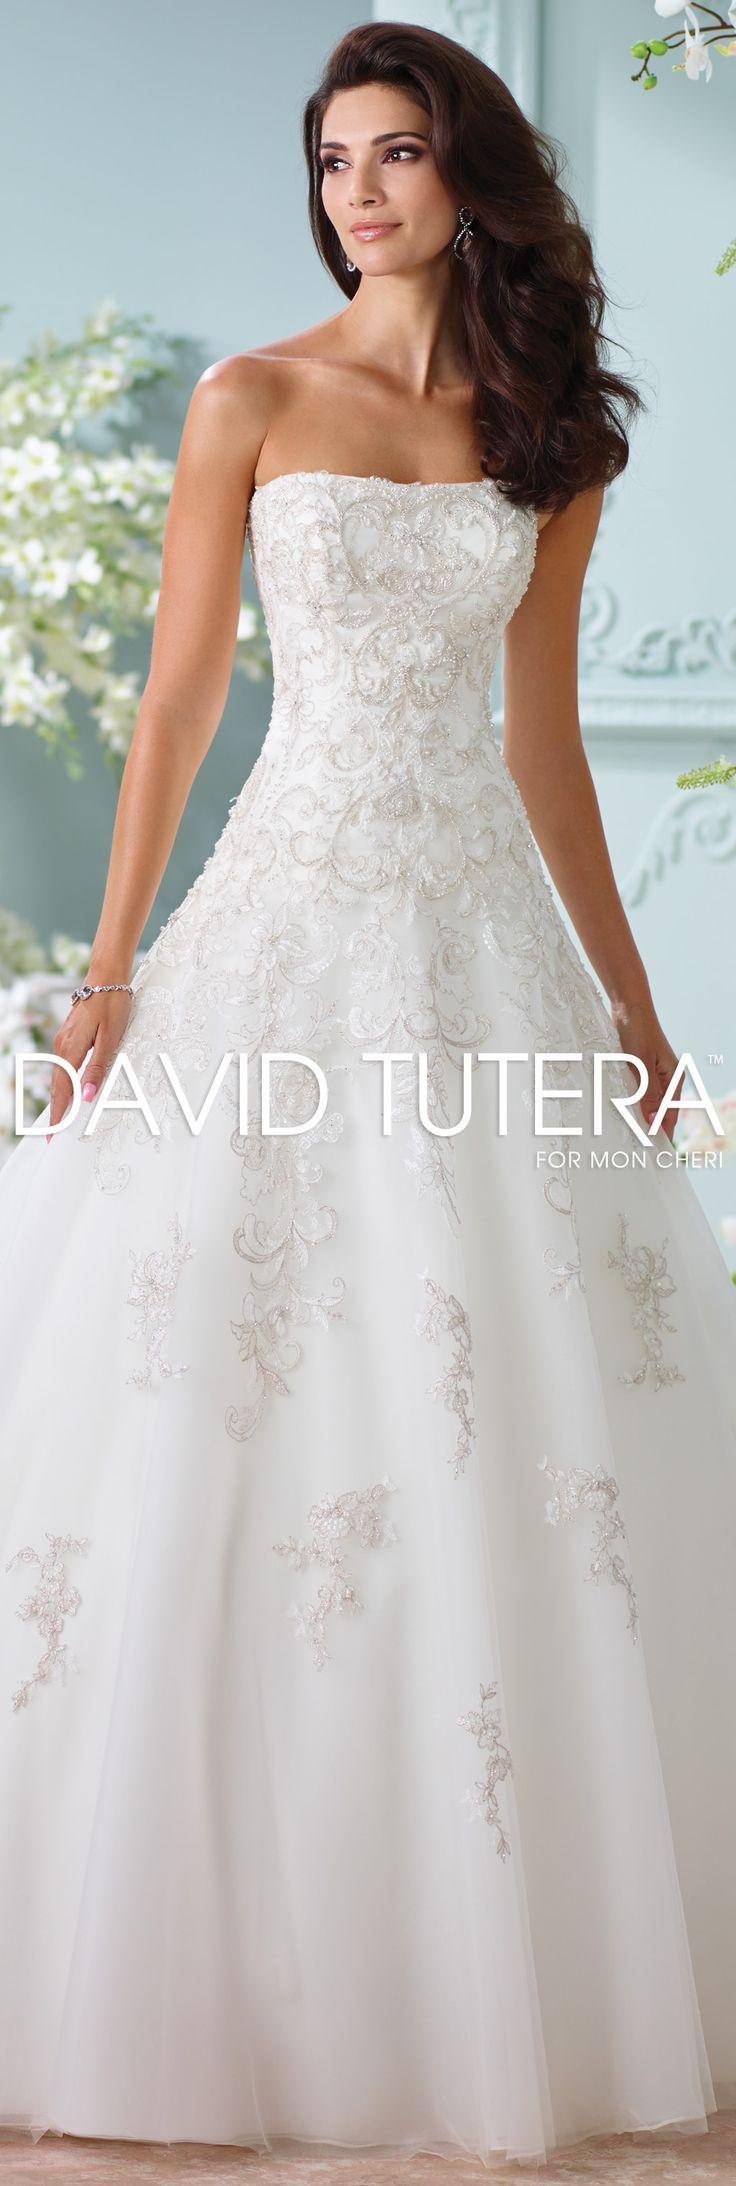 The David Tutera for Mon Cheri Spring 2016 Wedding Gown Collection - Style No. 116216 Sunniva #laceweddingdresses